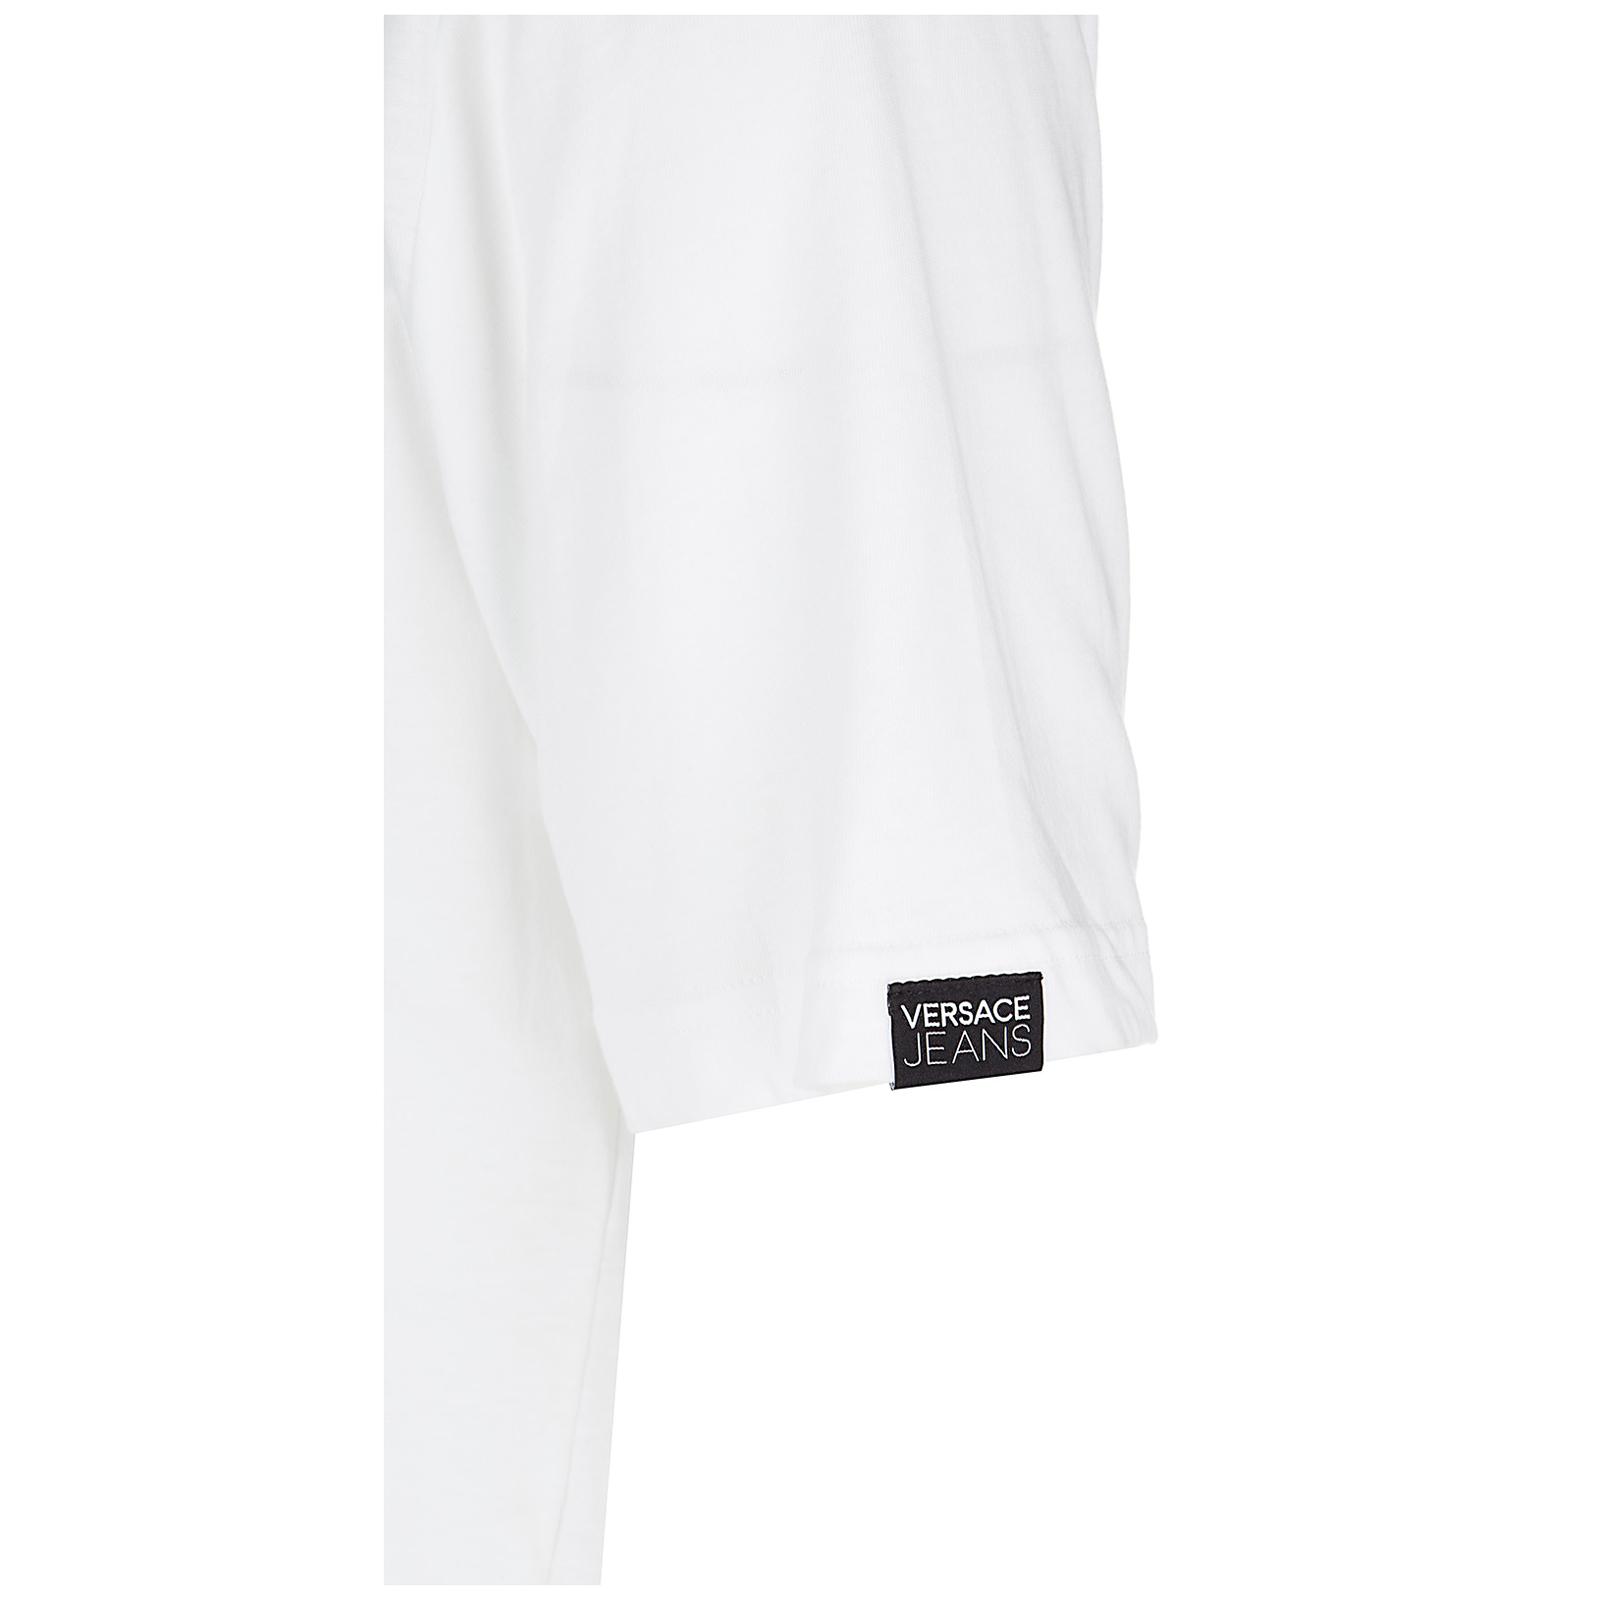 Men's short sleeve t-shirt crew neckline jumper jersey